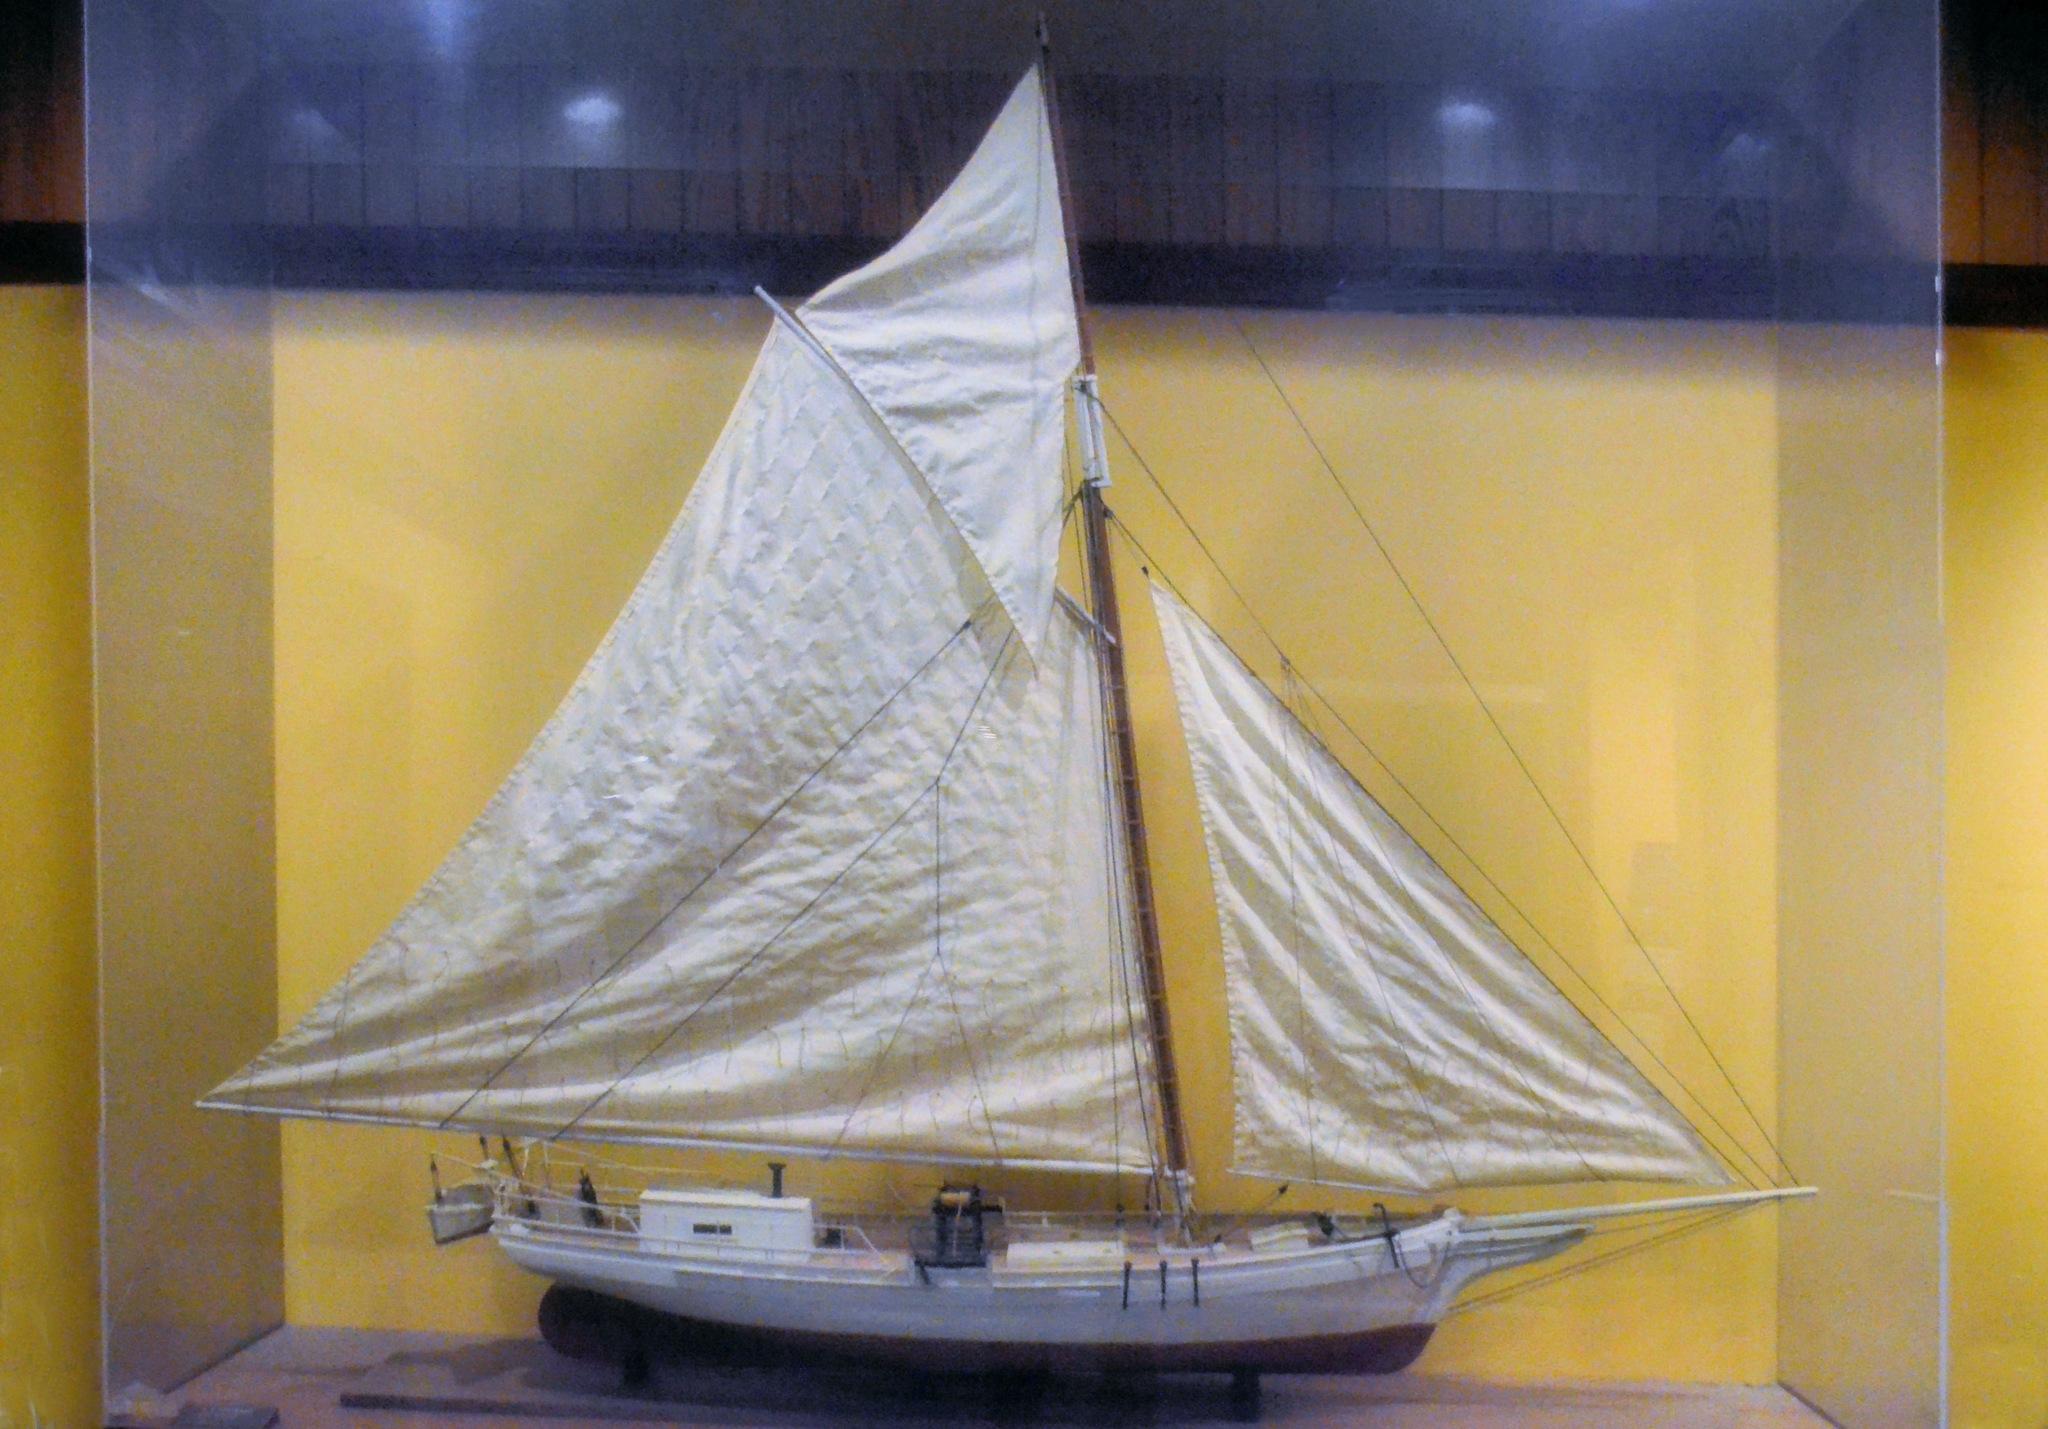 Oyster Boat by JimFleenor